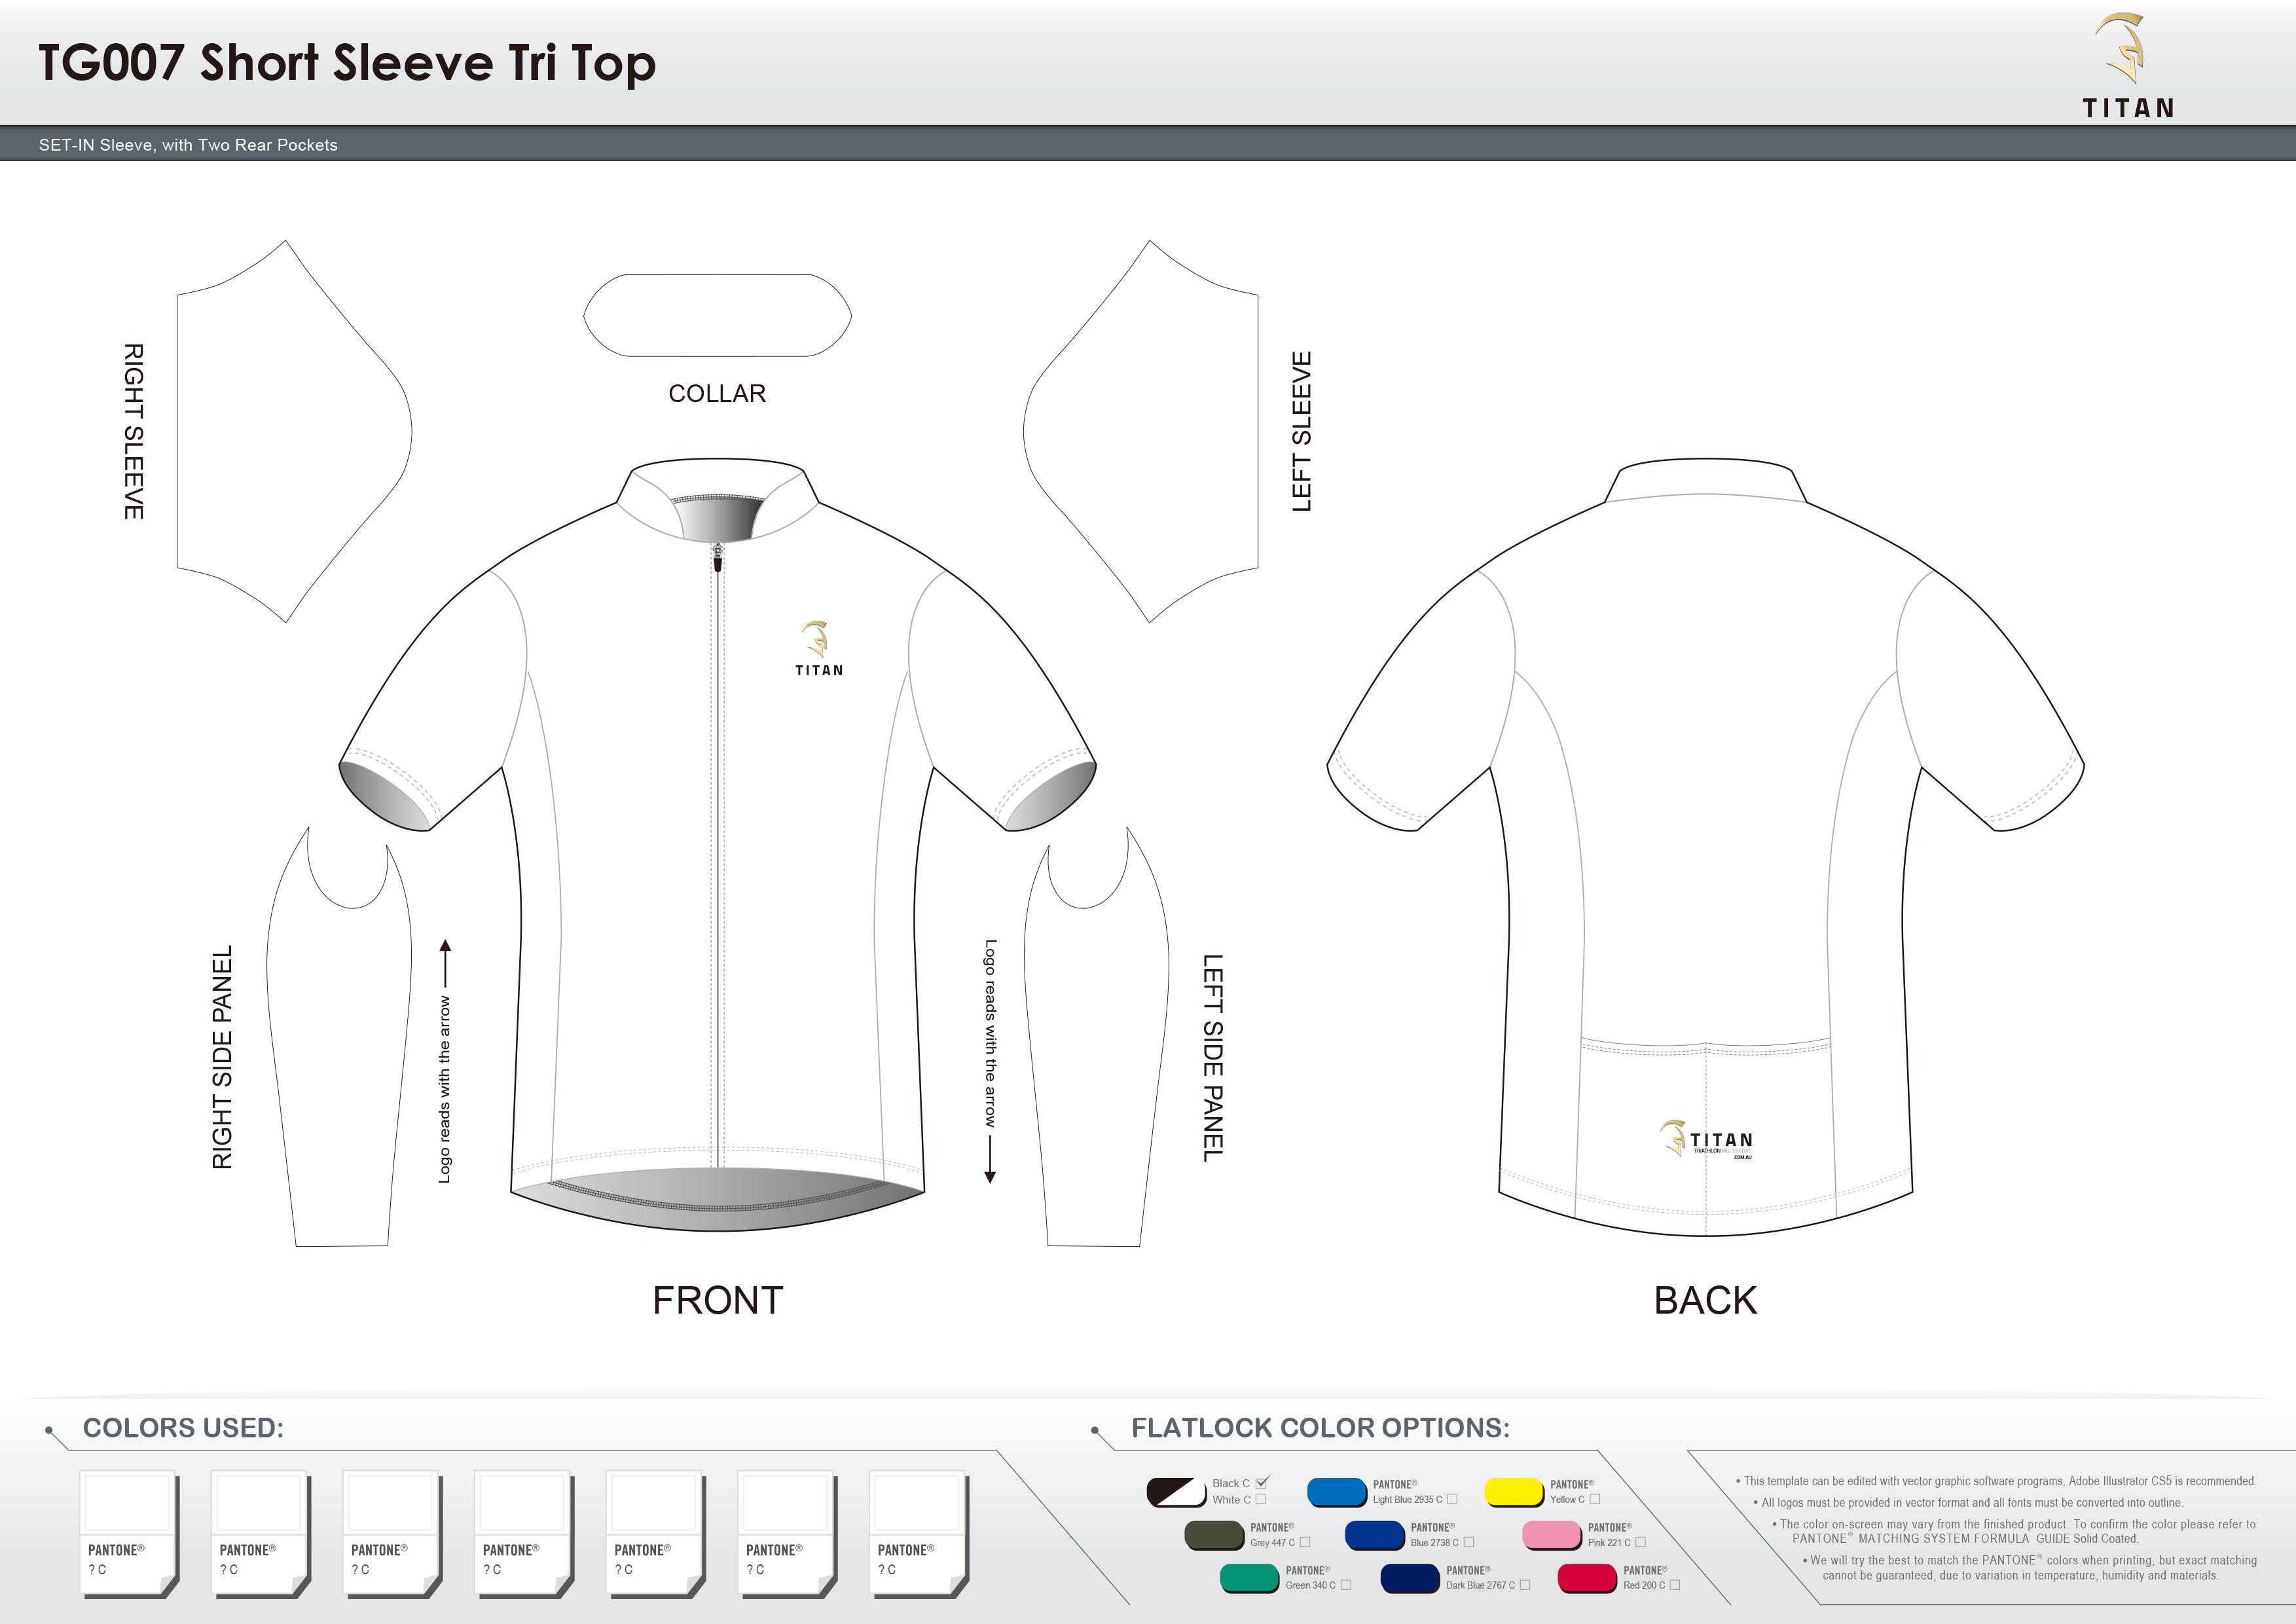 TG007 Short Sleeve Tri Top